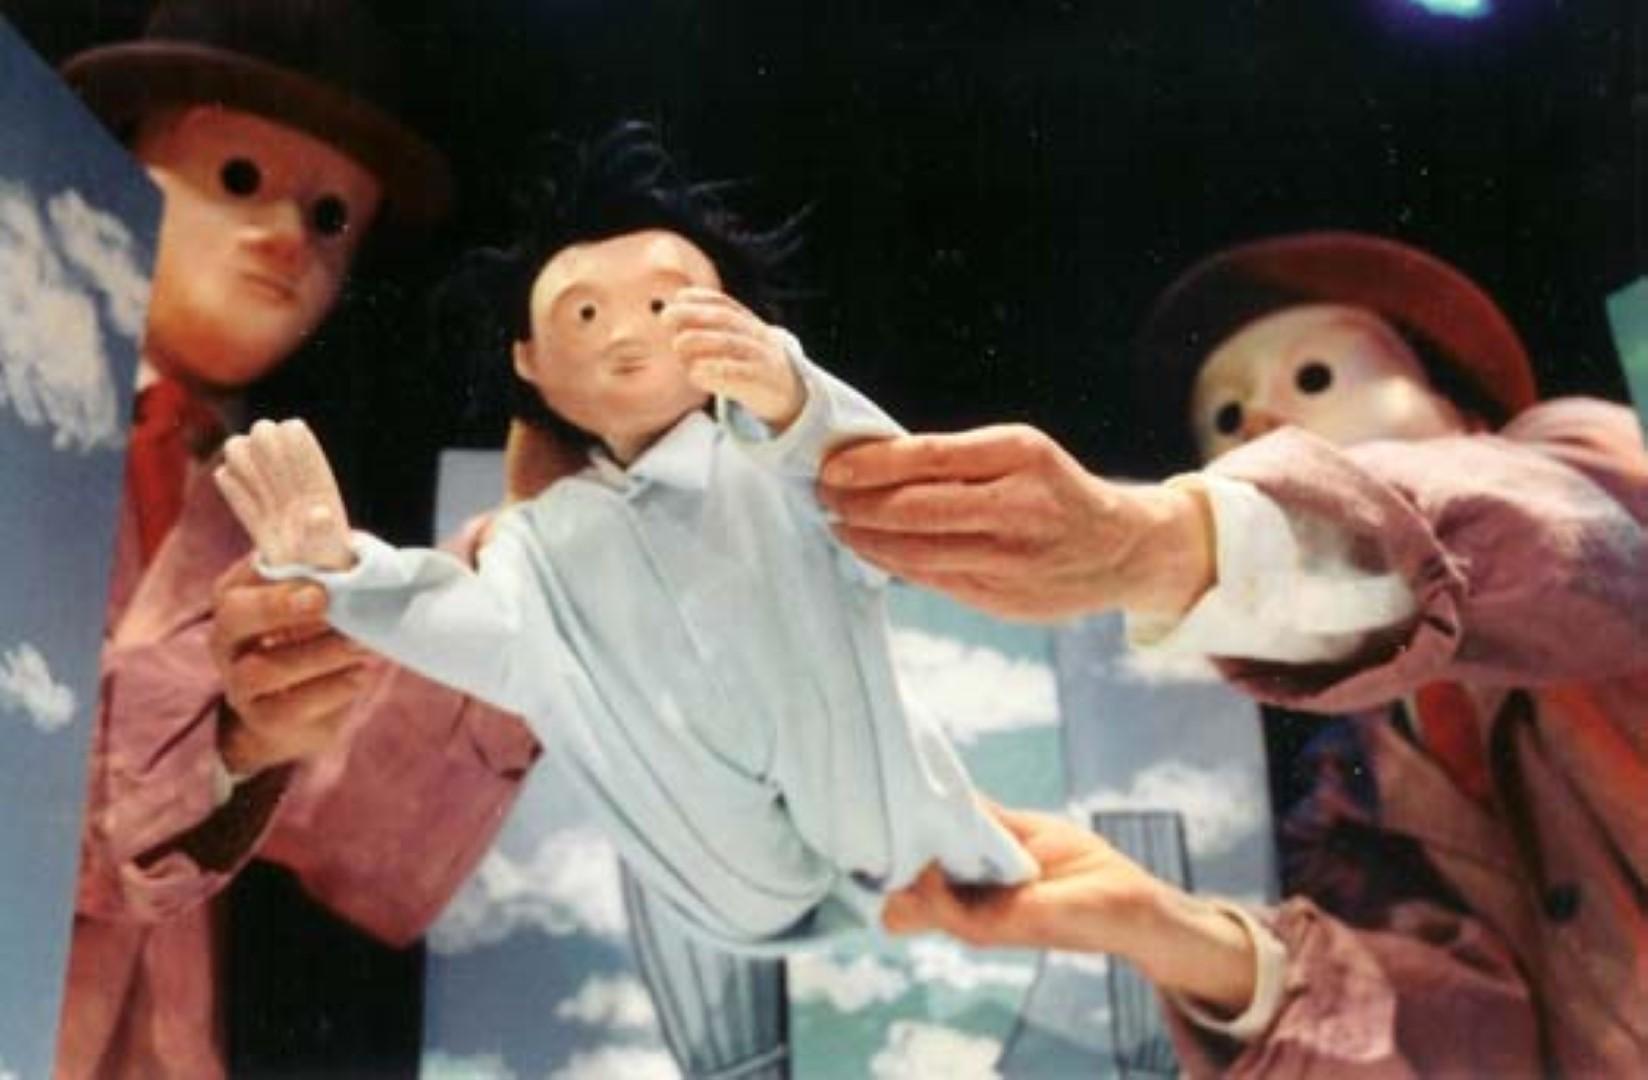 Rene-puppet-02